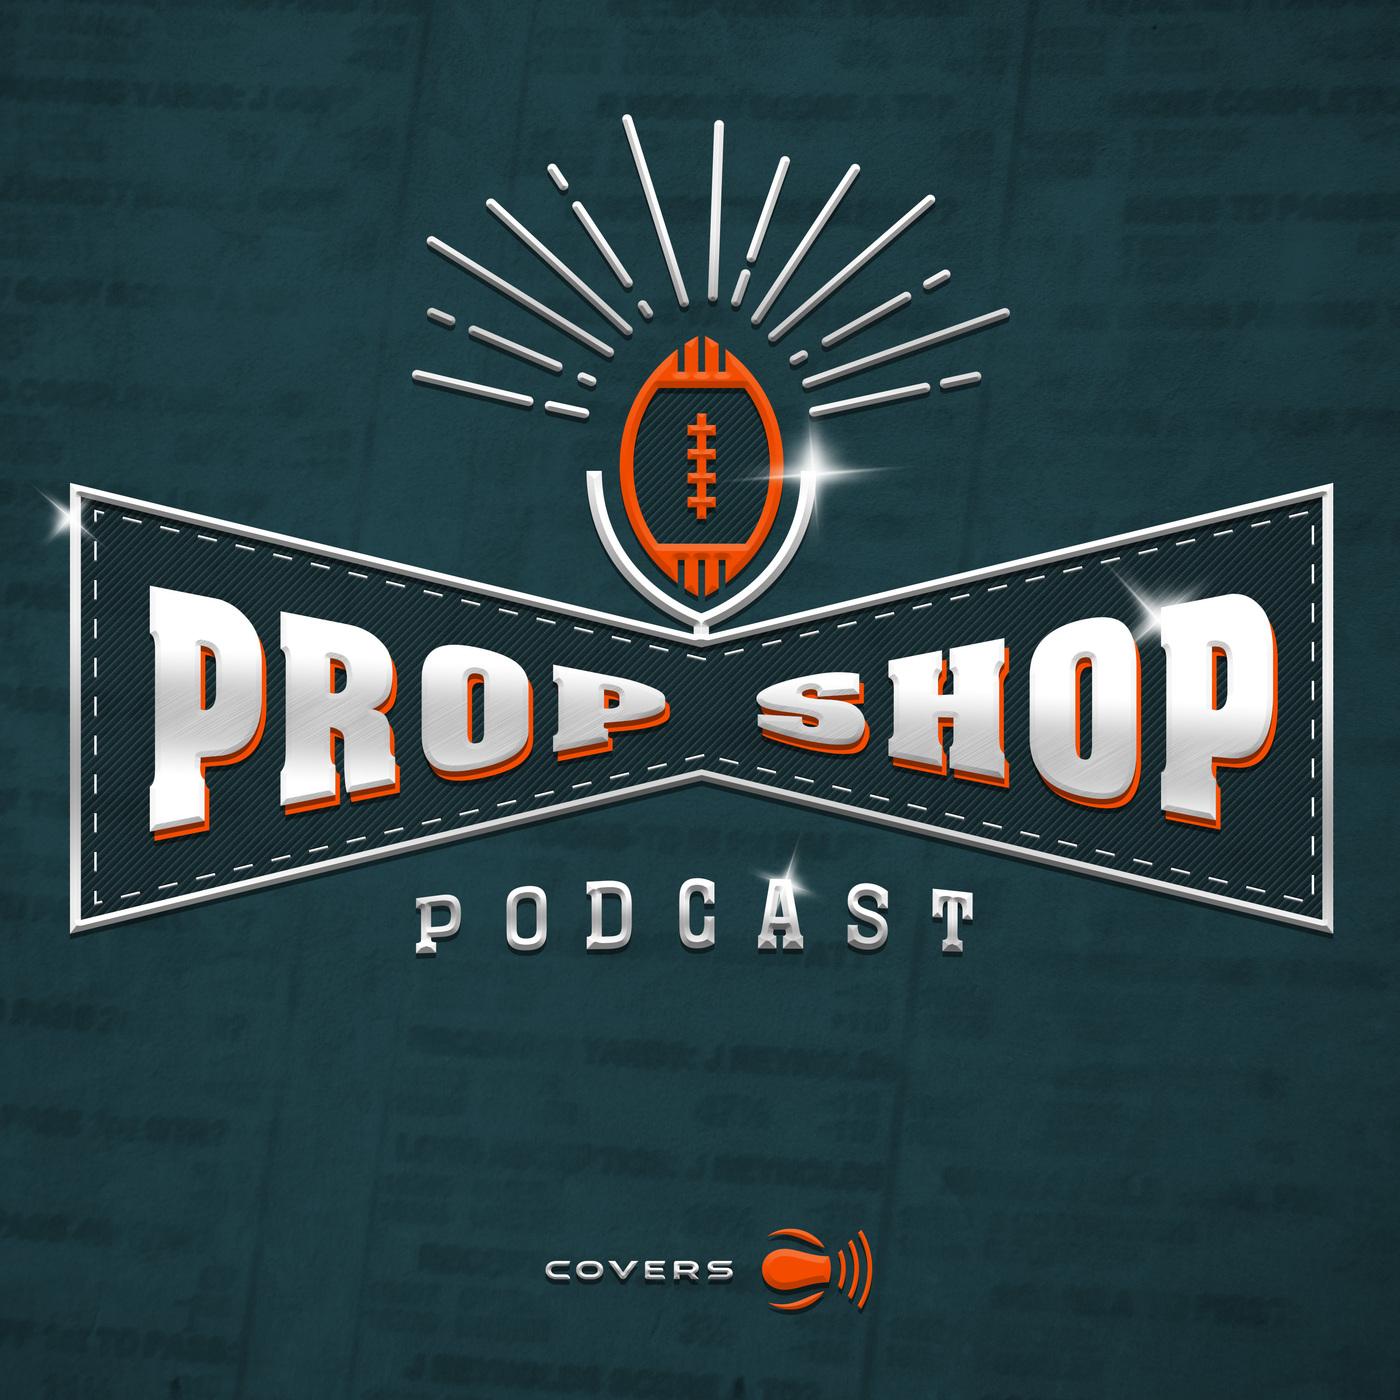 Episode 10: NFL Week 2 - Lamar Jackson, Tyreek Hill fallout, best bets and more!